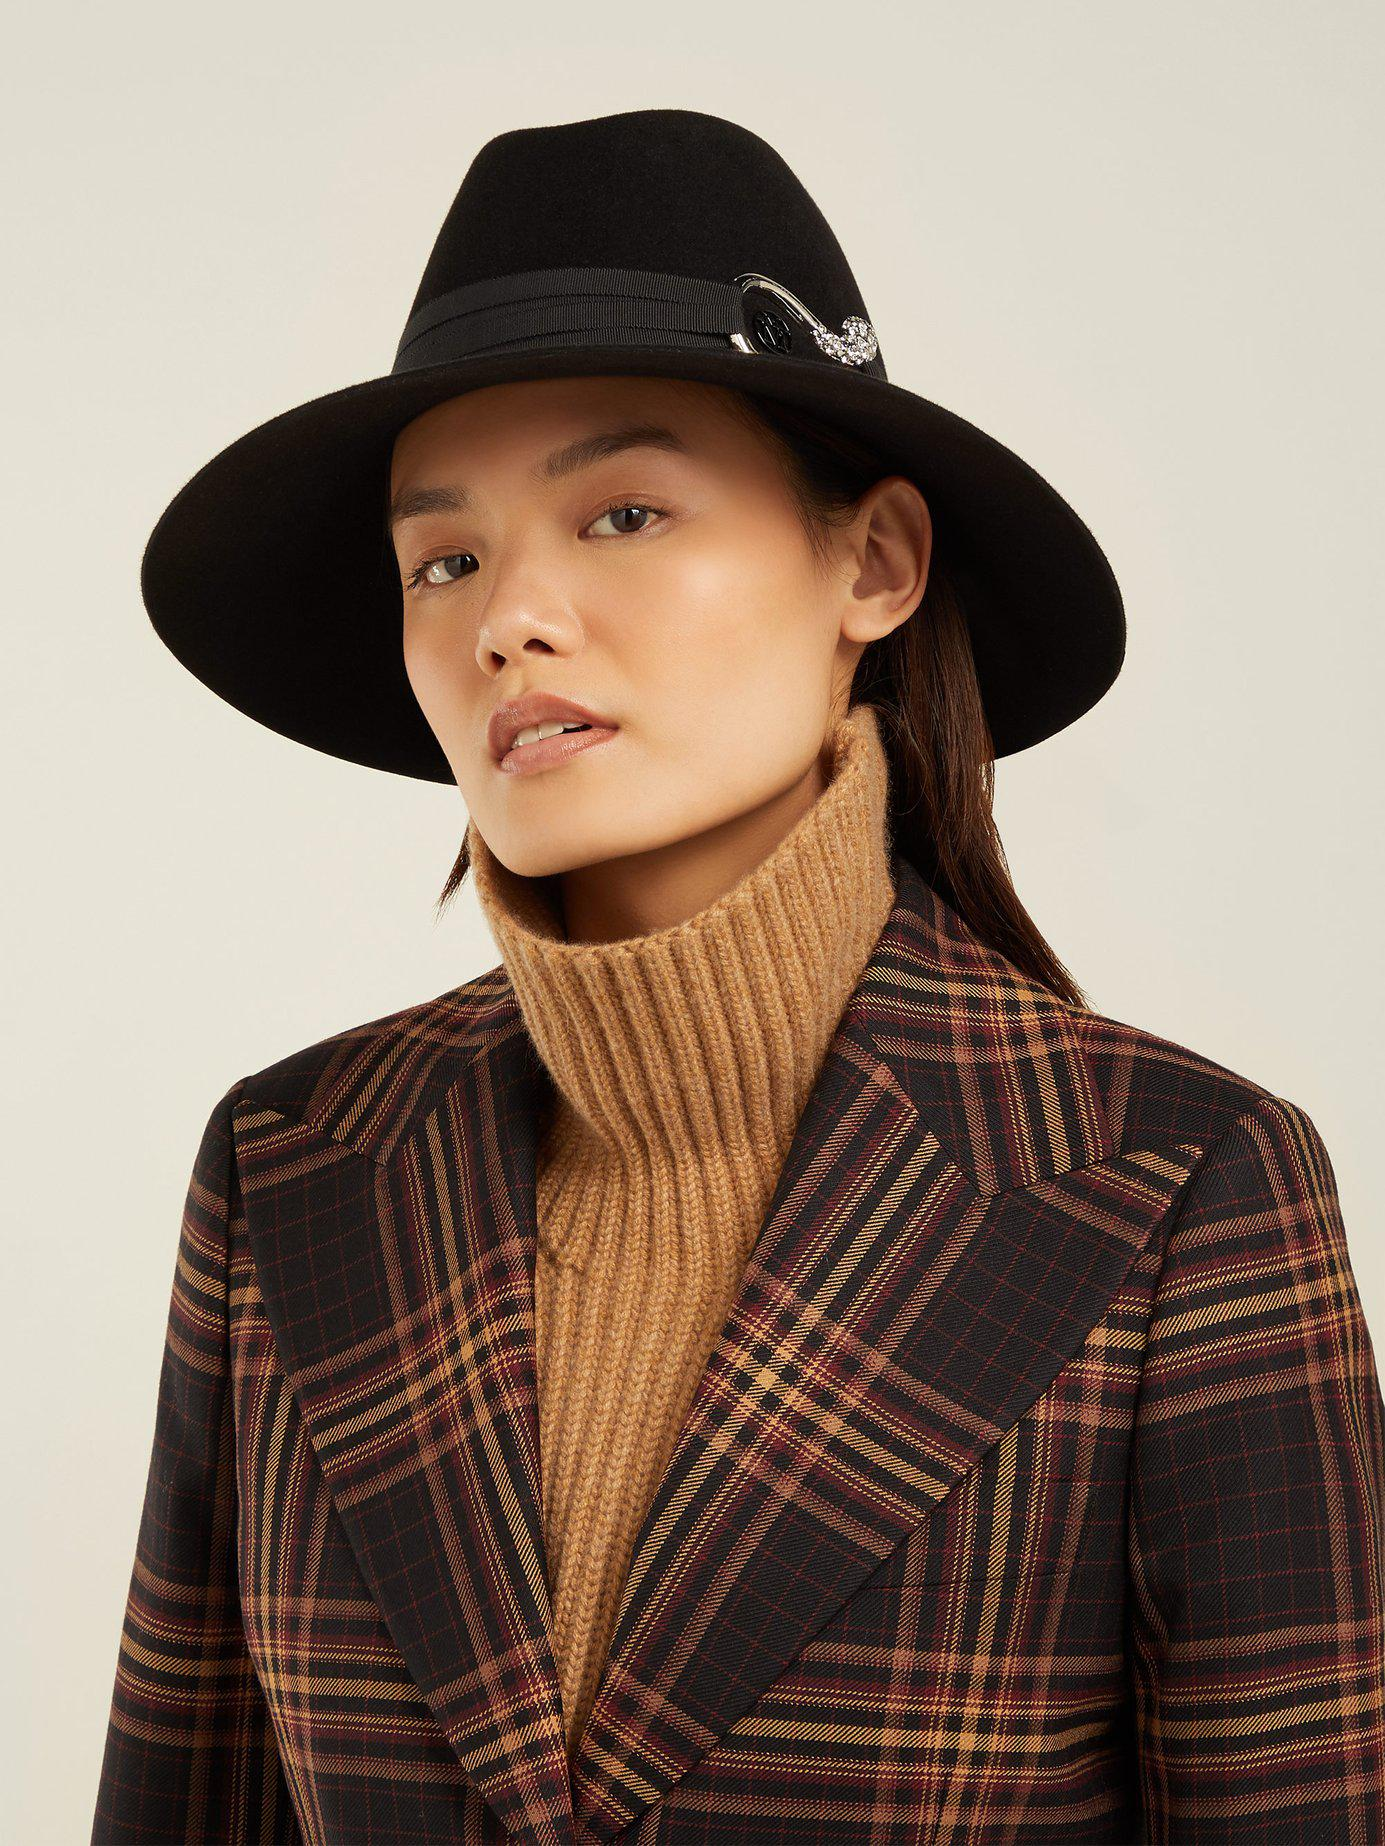 8c402543eb7d8 Lyst - Maison Michel Kate Felt Fedora Hat in Black - Save 25.69832402234637%